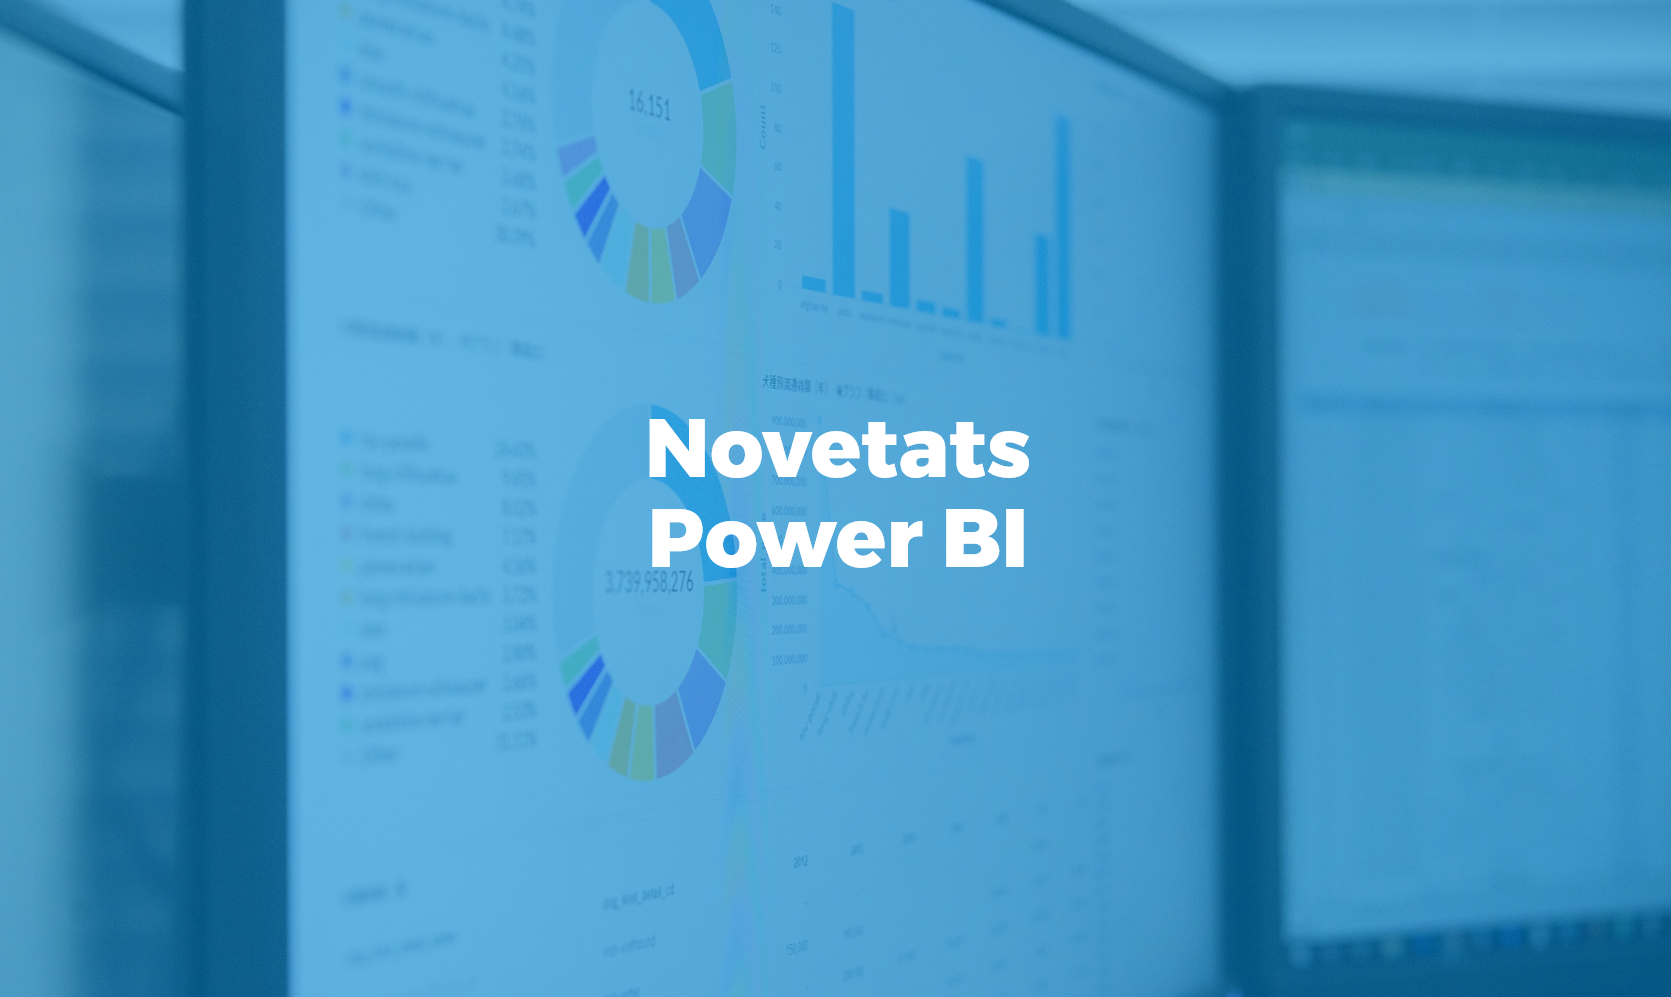 Bismart Business Intelligence Novetats power bi